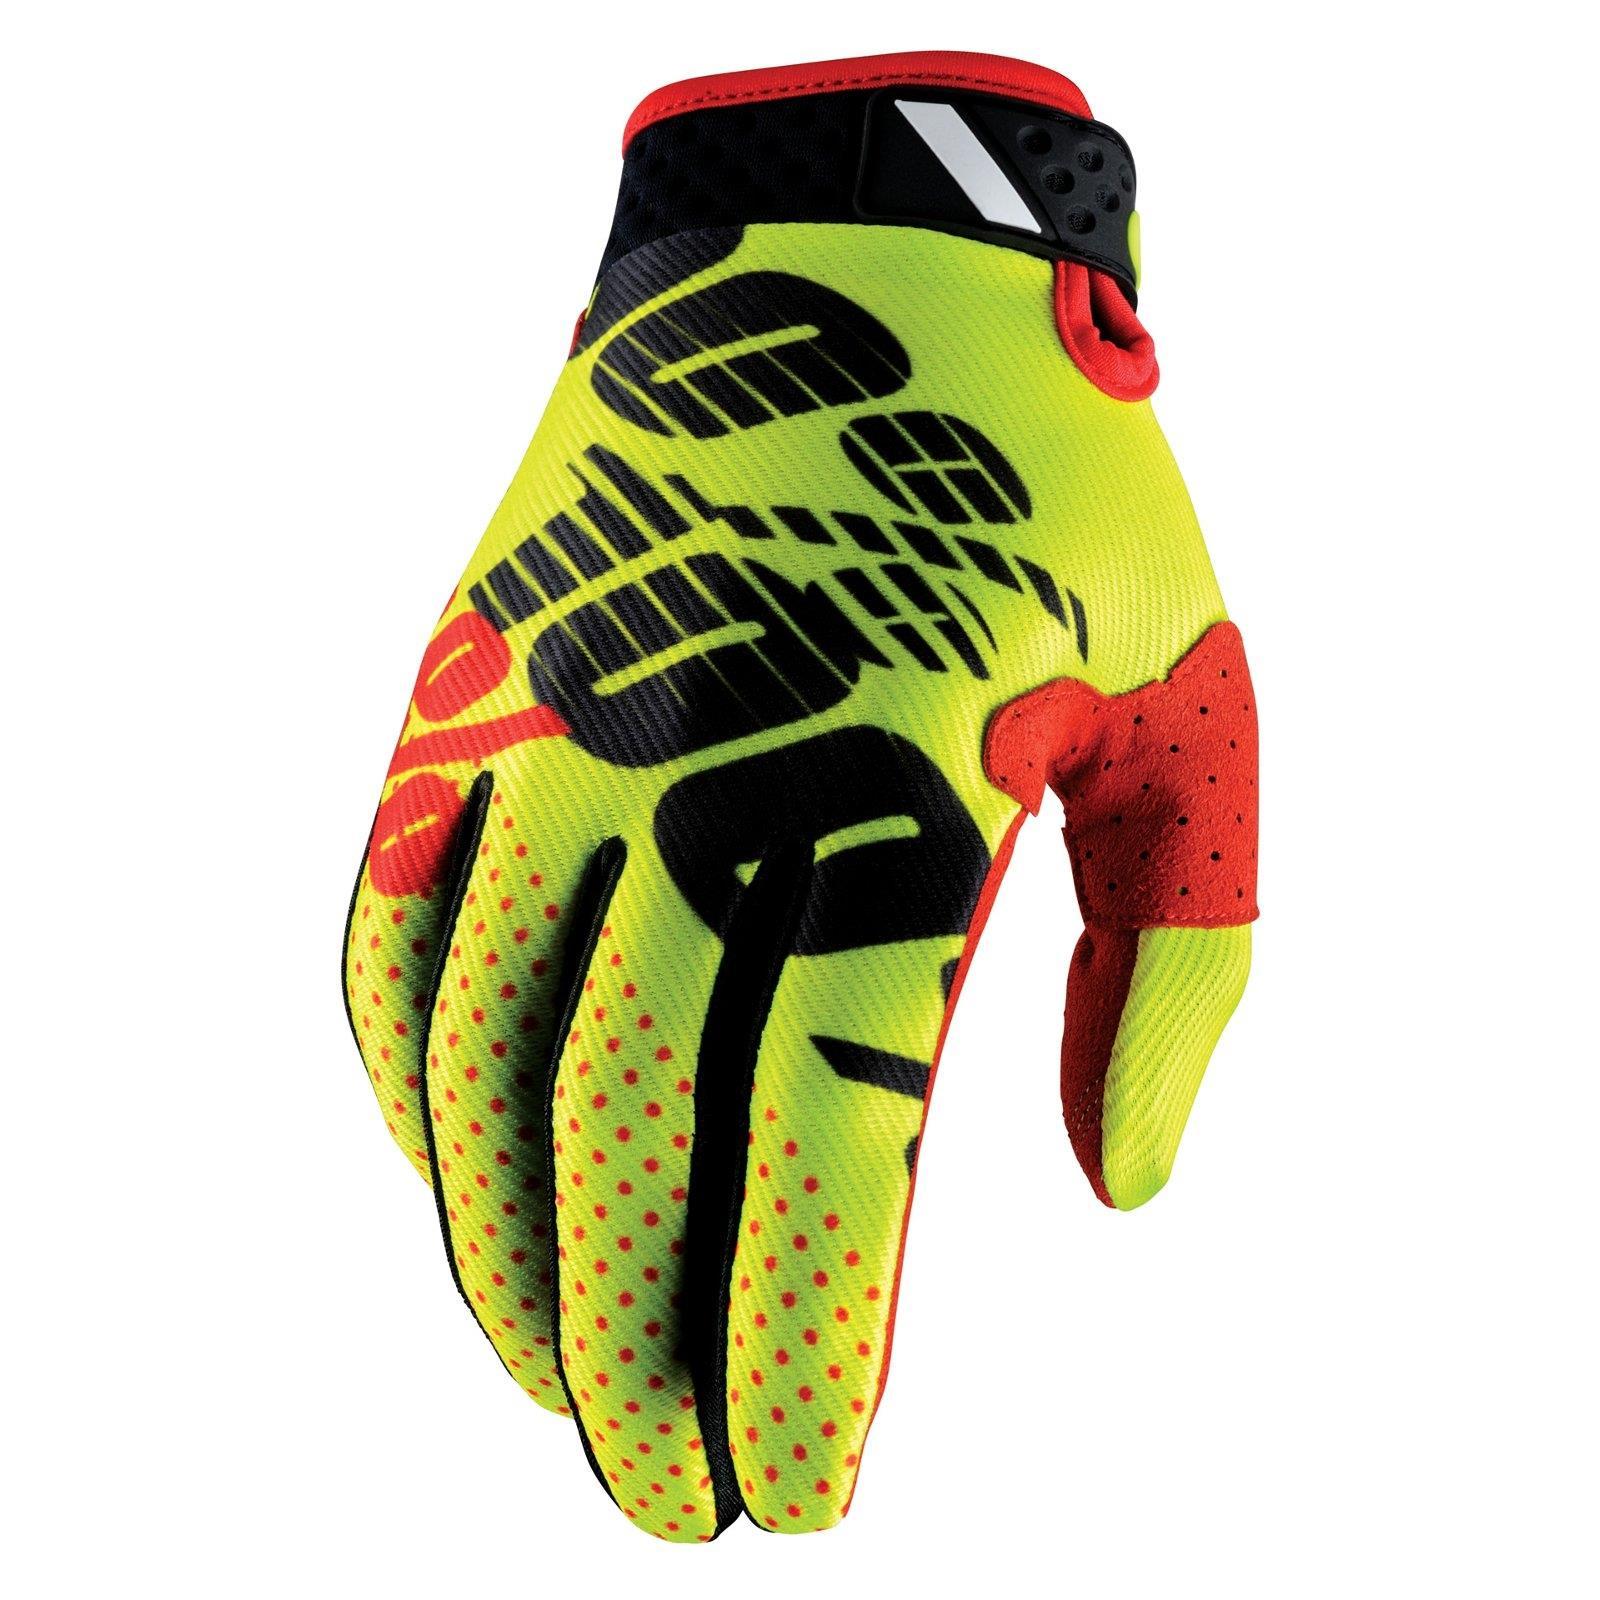 Gr/ö/ße S 100/% Prozent iTrack Handschuhe Clarino MTB DH MX Motocross Enduro Offroad Quad HU-GLO-0002 Farbe Rot